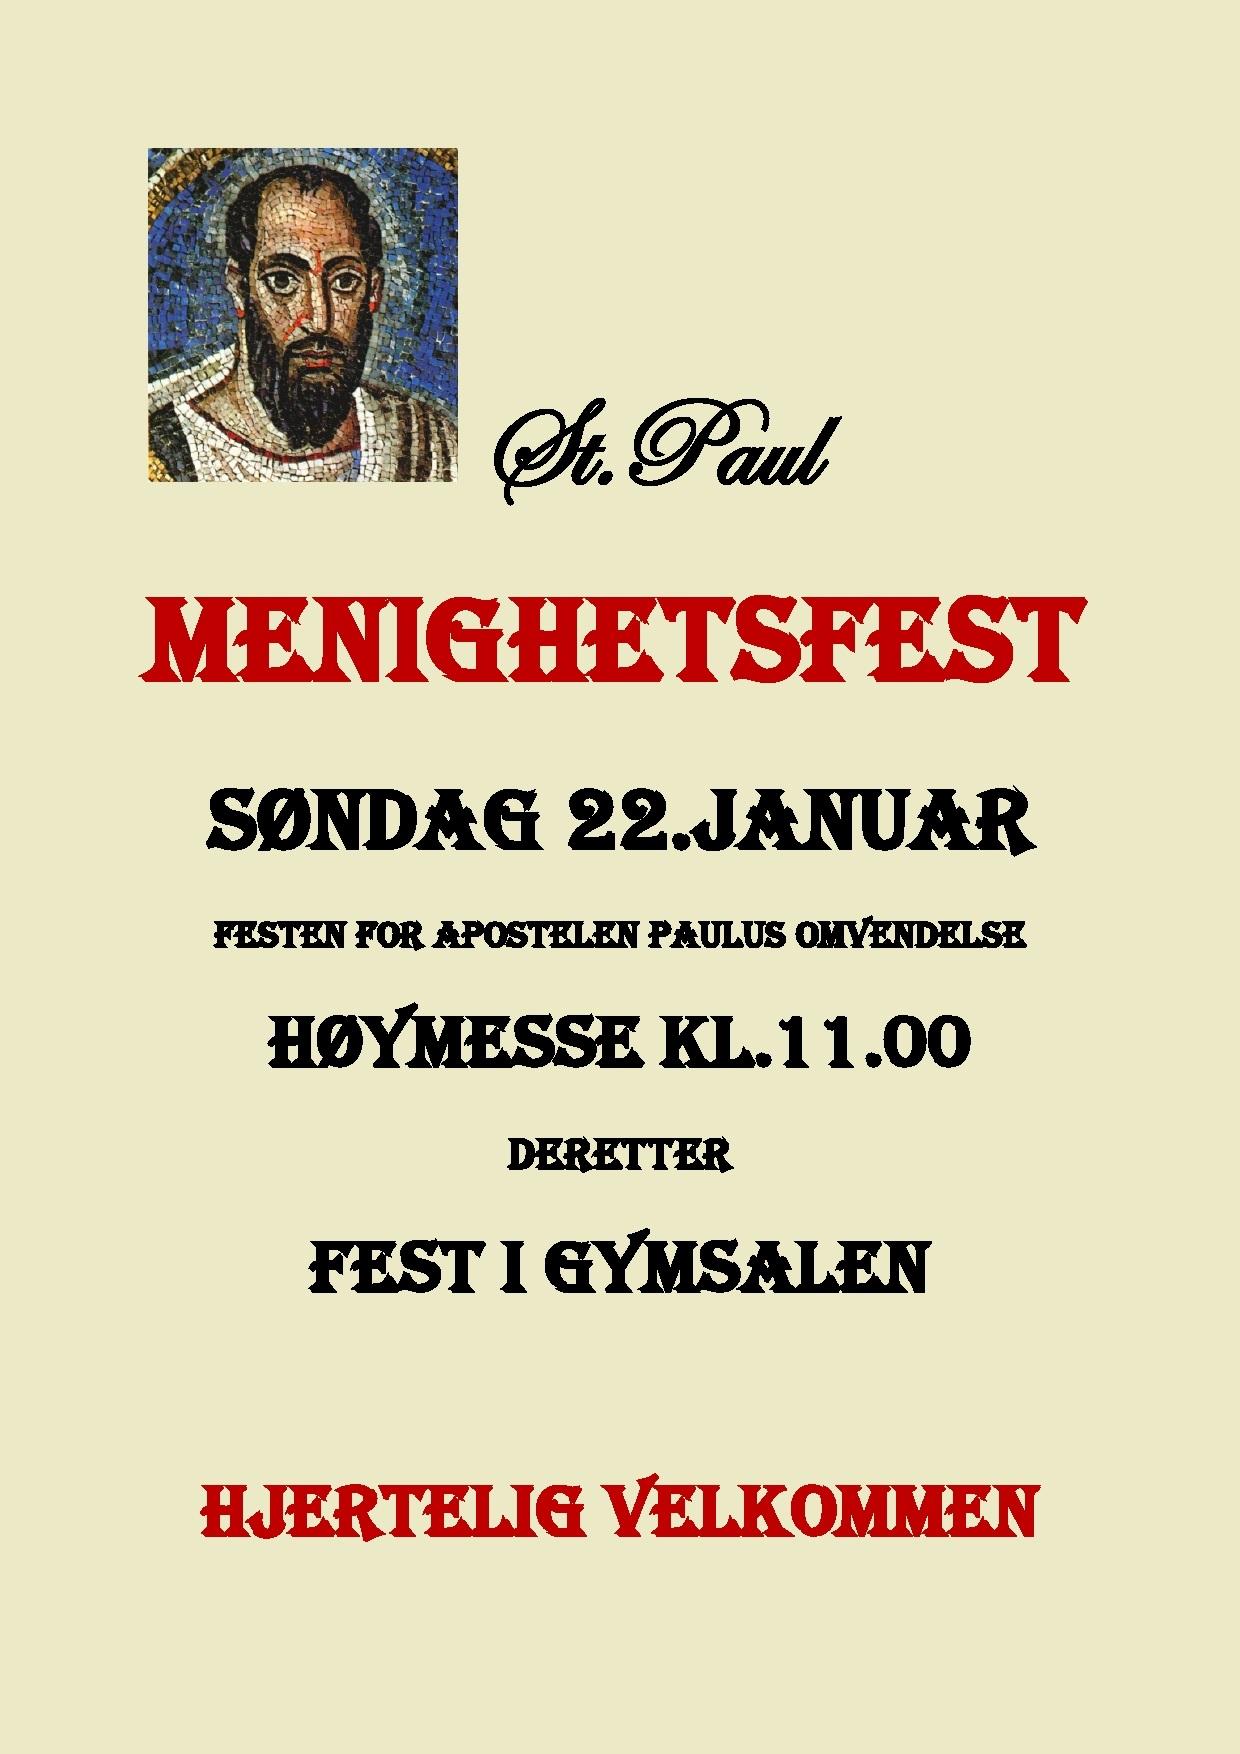 menighetsfest 20117-page0001